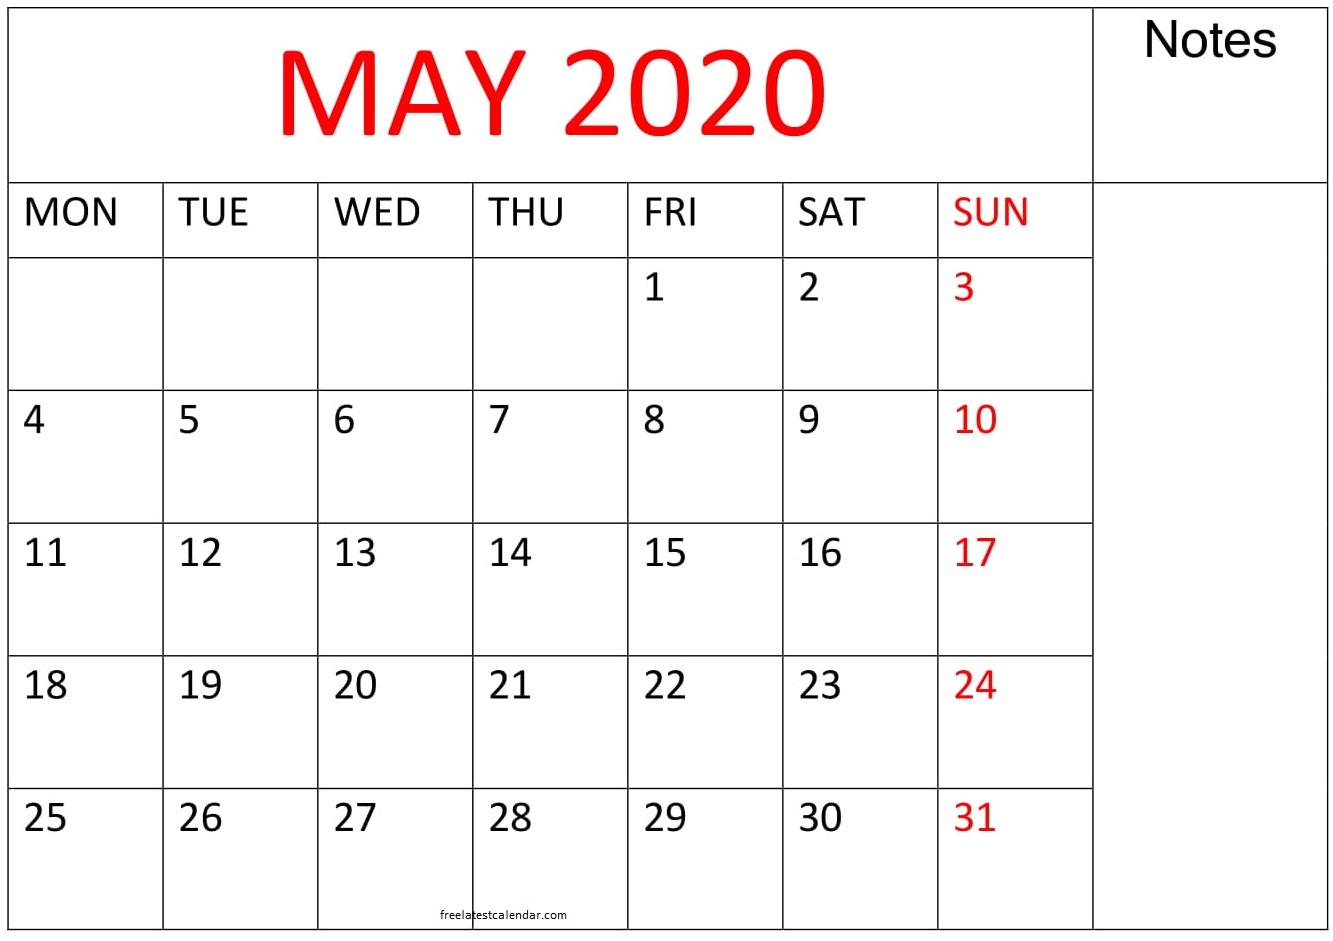 Printable May 2020 Calendar Large Print – Free Latest with regard to Printable Calendar Date Range